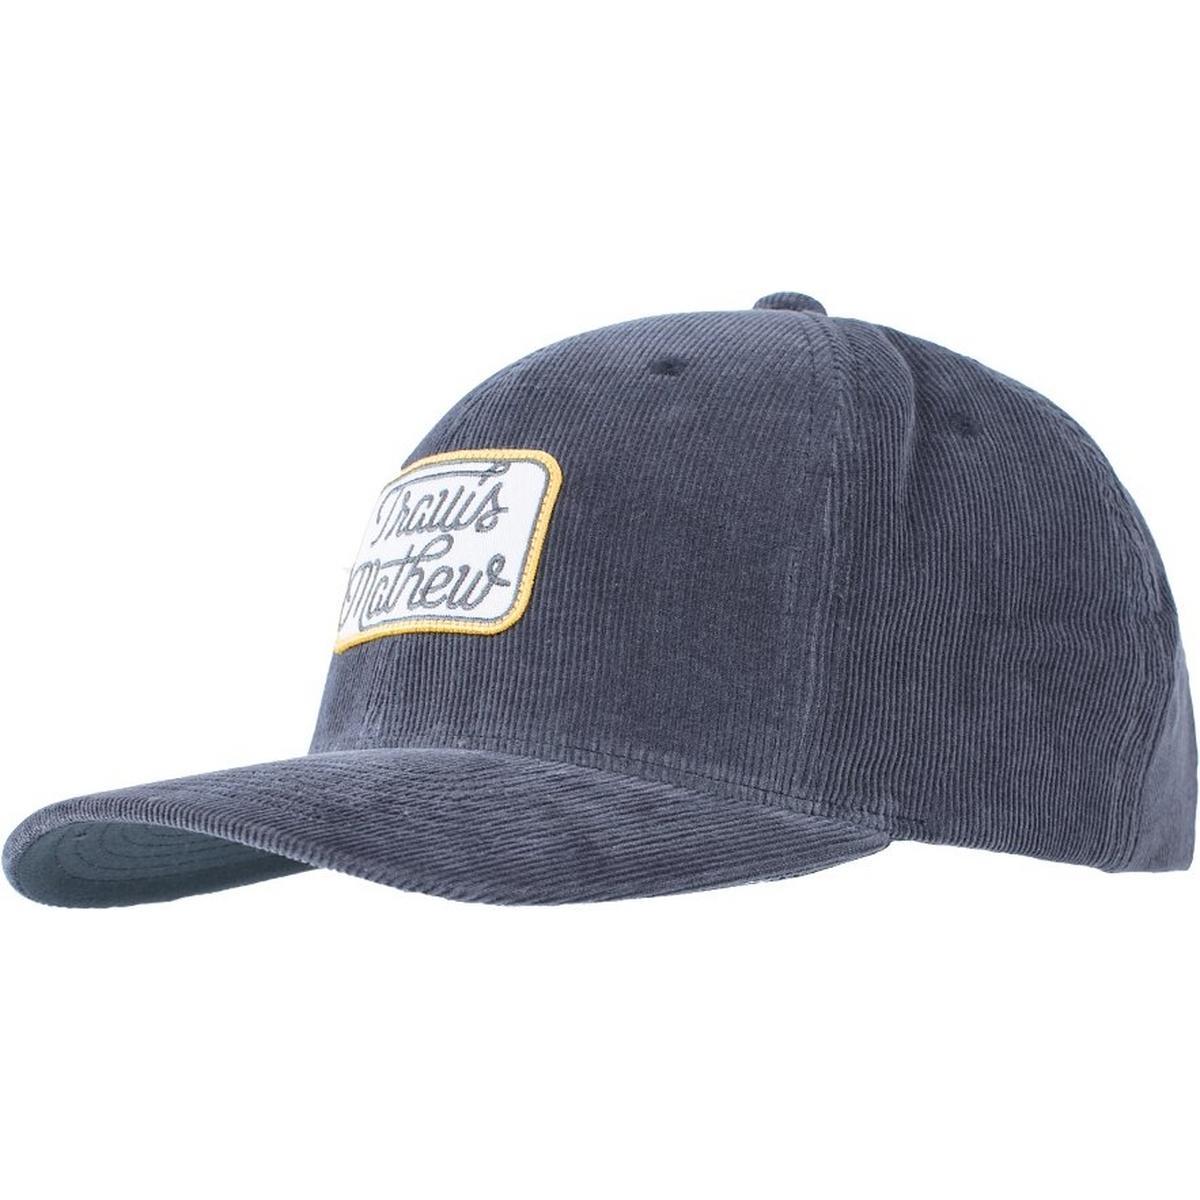 ... snapback hat heather grey d7c2d e721e promo code travis mathew mens  noise cap d448d 58cca ... 8b1abd387fcf